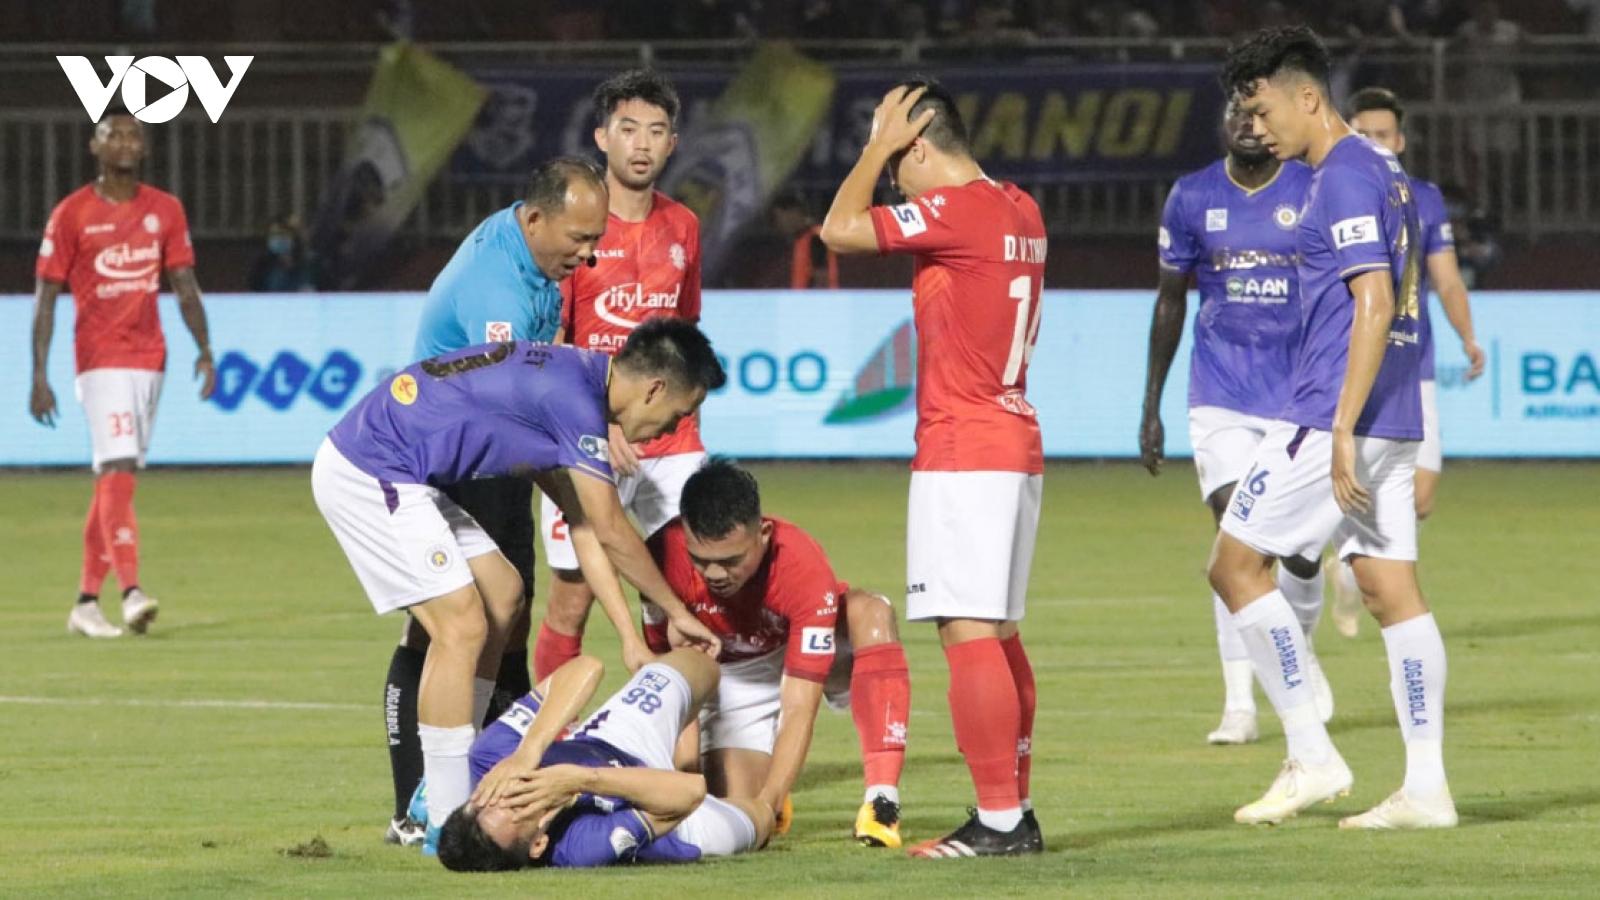 Int'l media express shock at V.League 1 horror challenge